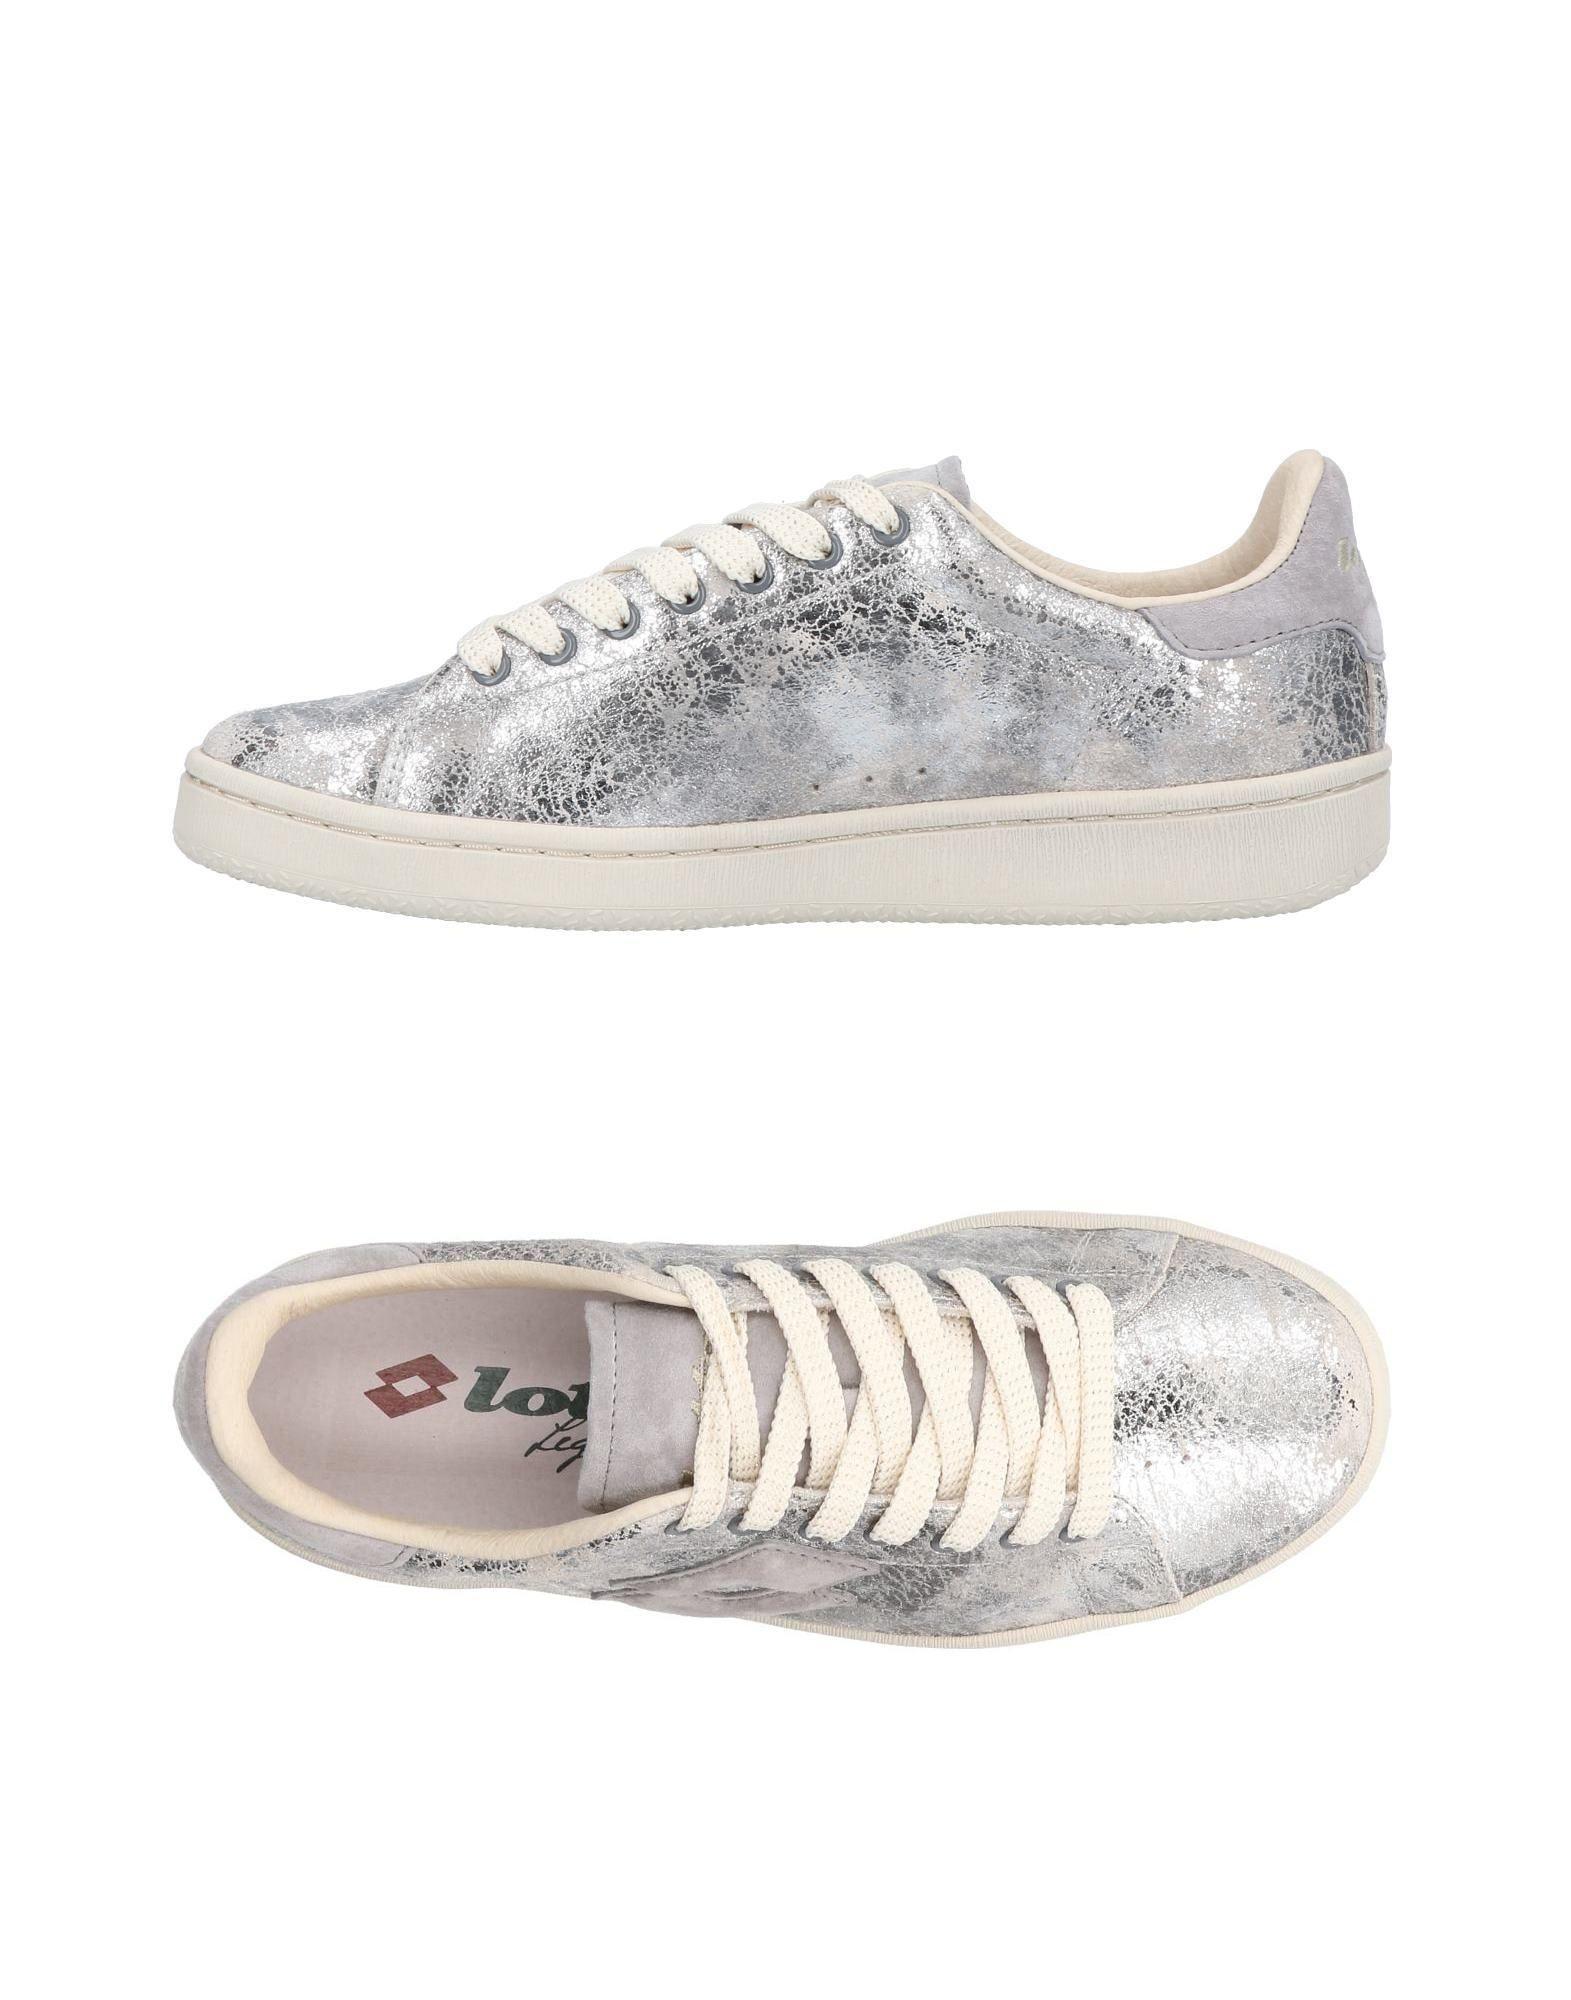 Lotto Leggenda Sneakers In Grey